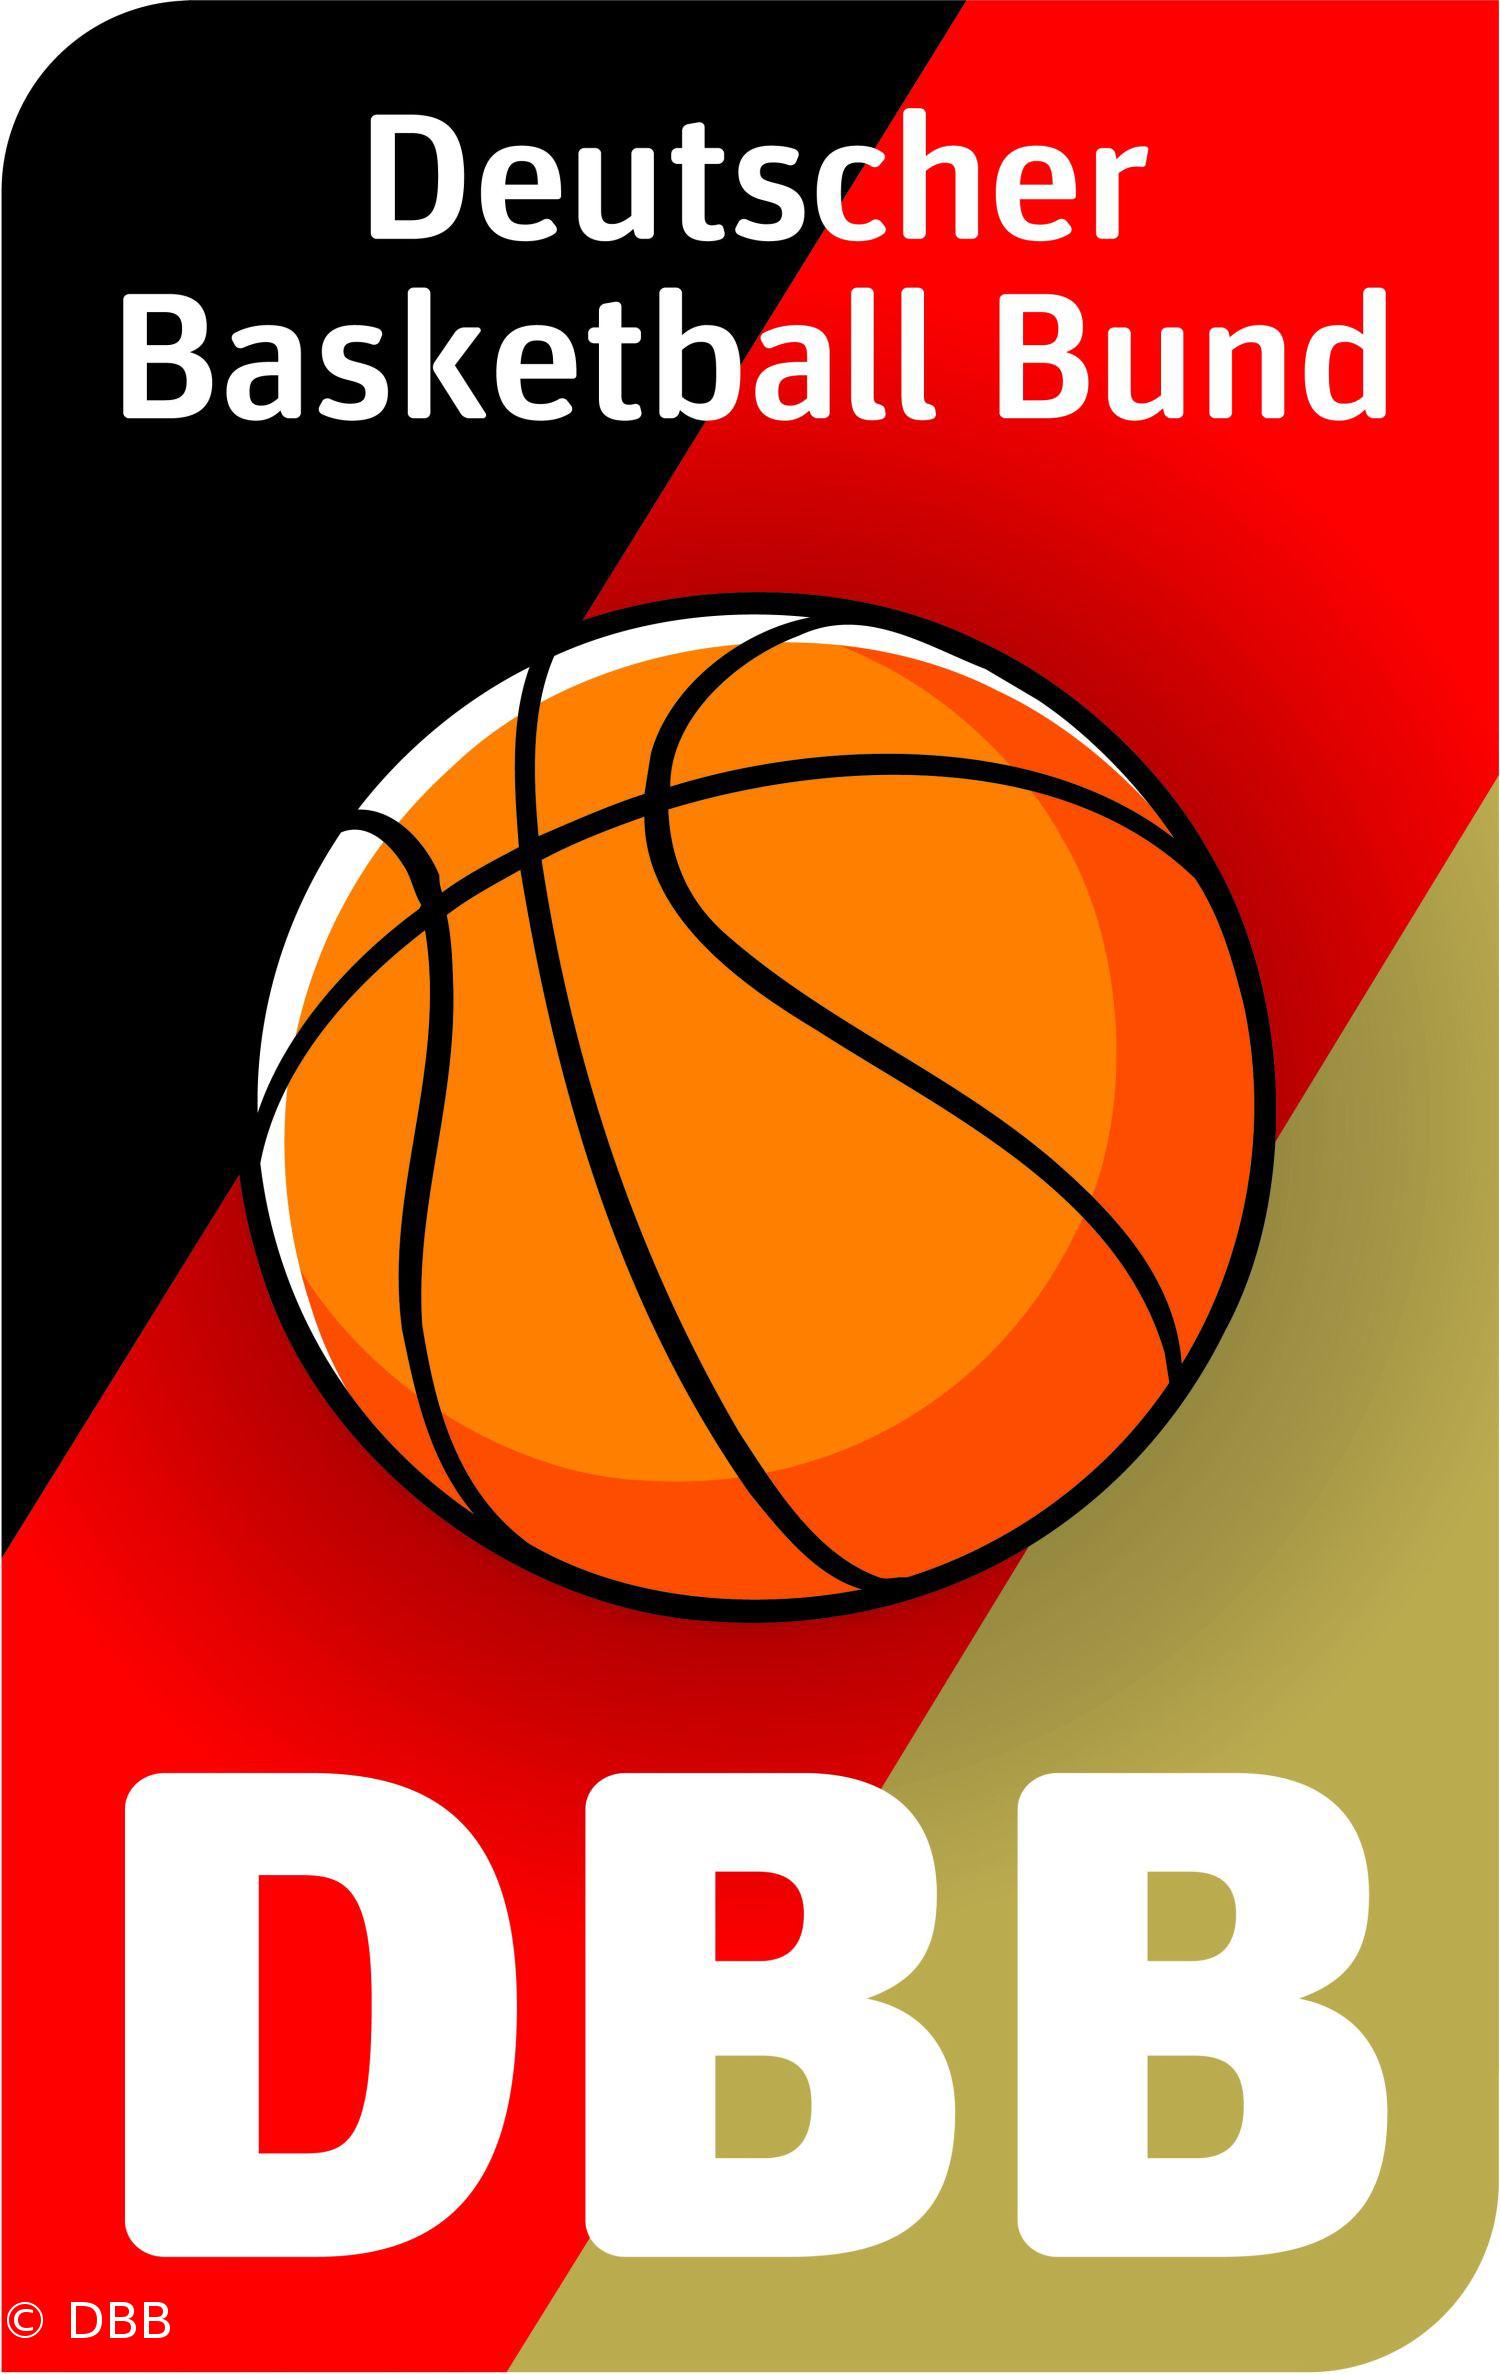 DBB nominiert U20-Herren Nationalteam